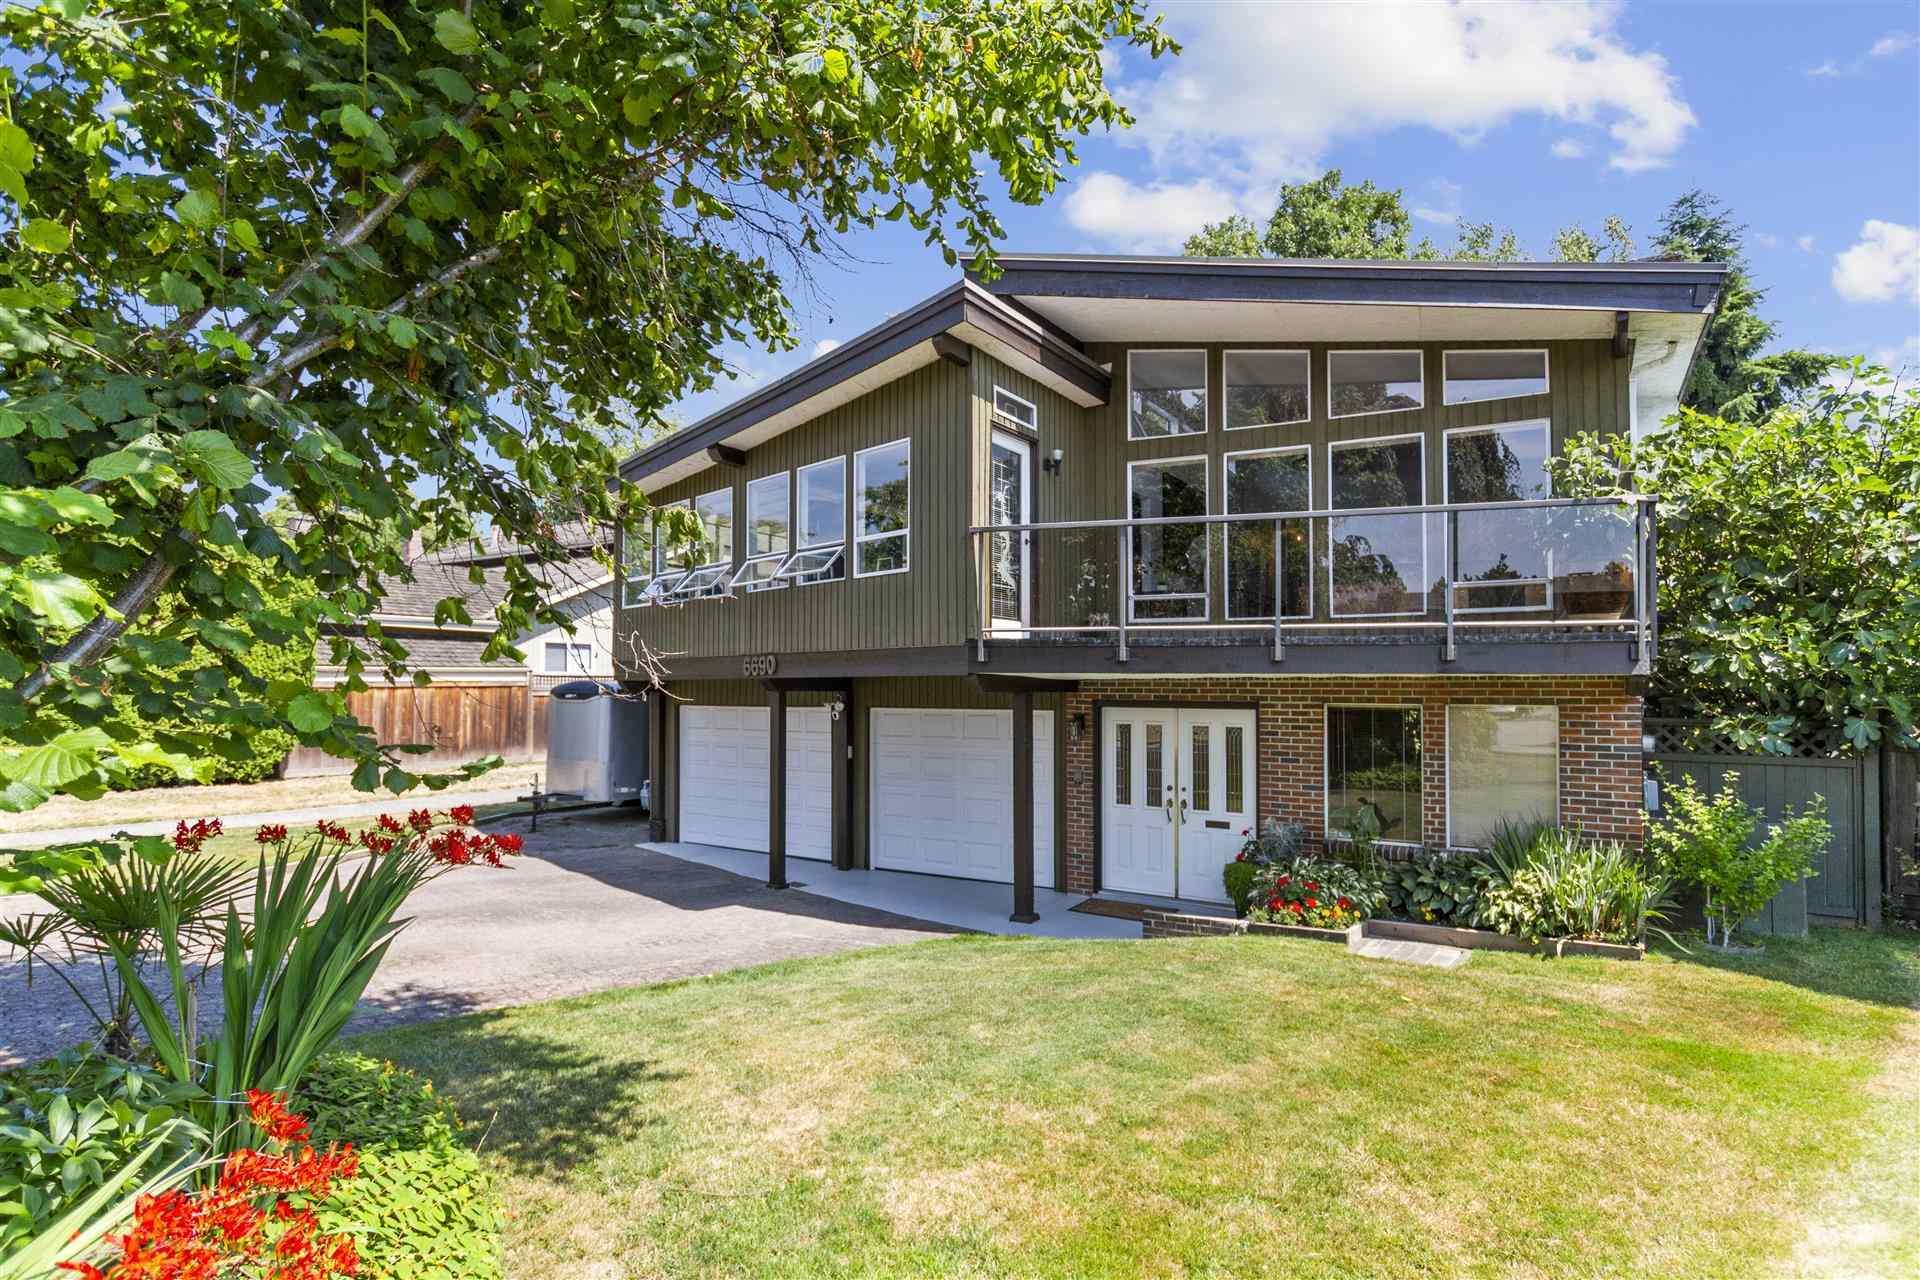 6690 TODERICK STREET - Killarney VE House/Single Family for sale, 4 Bedrooms (R2602604) - #1